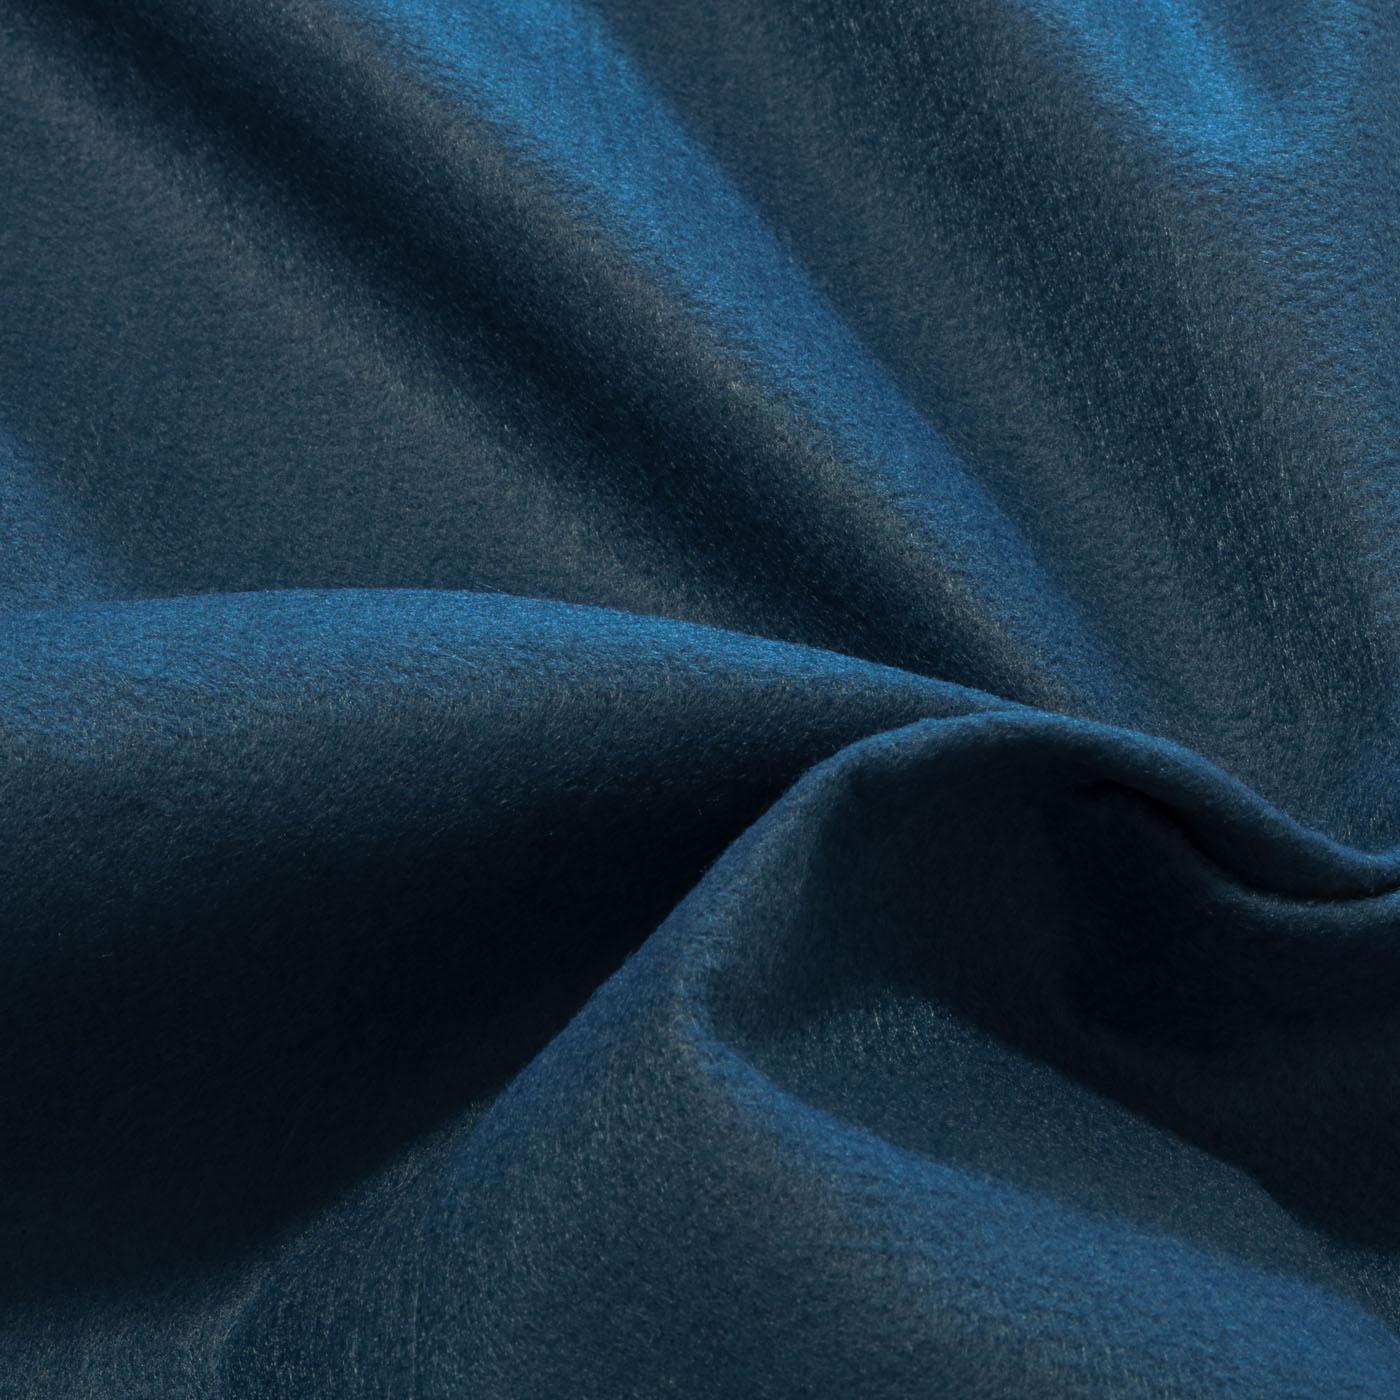 Tecido Feltro 100% Poliester 1,40 m Largura Azul Indigo